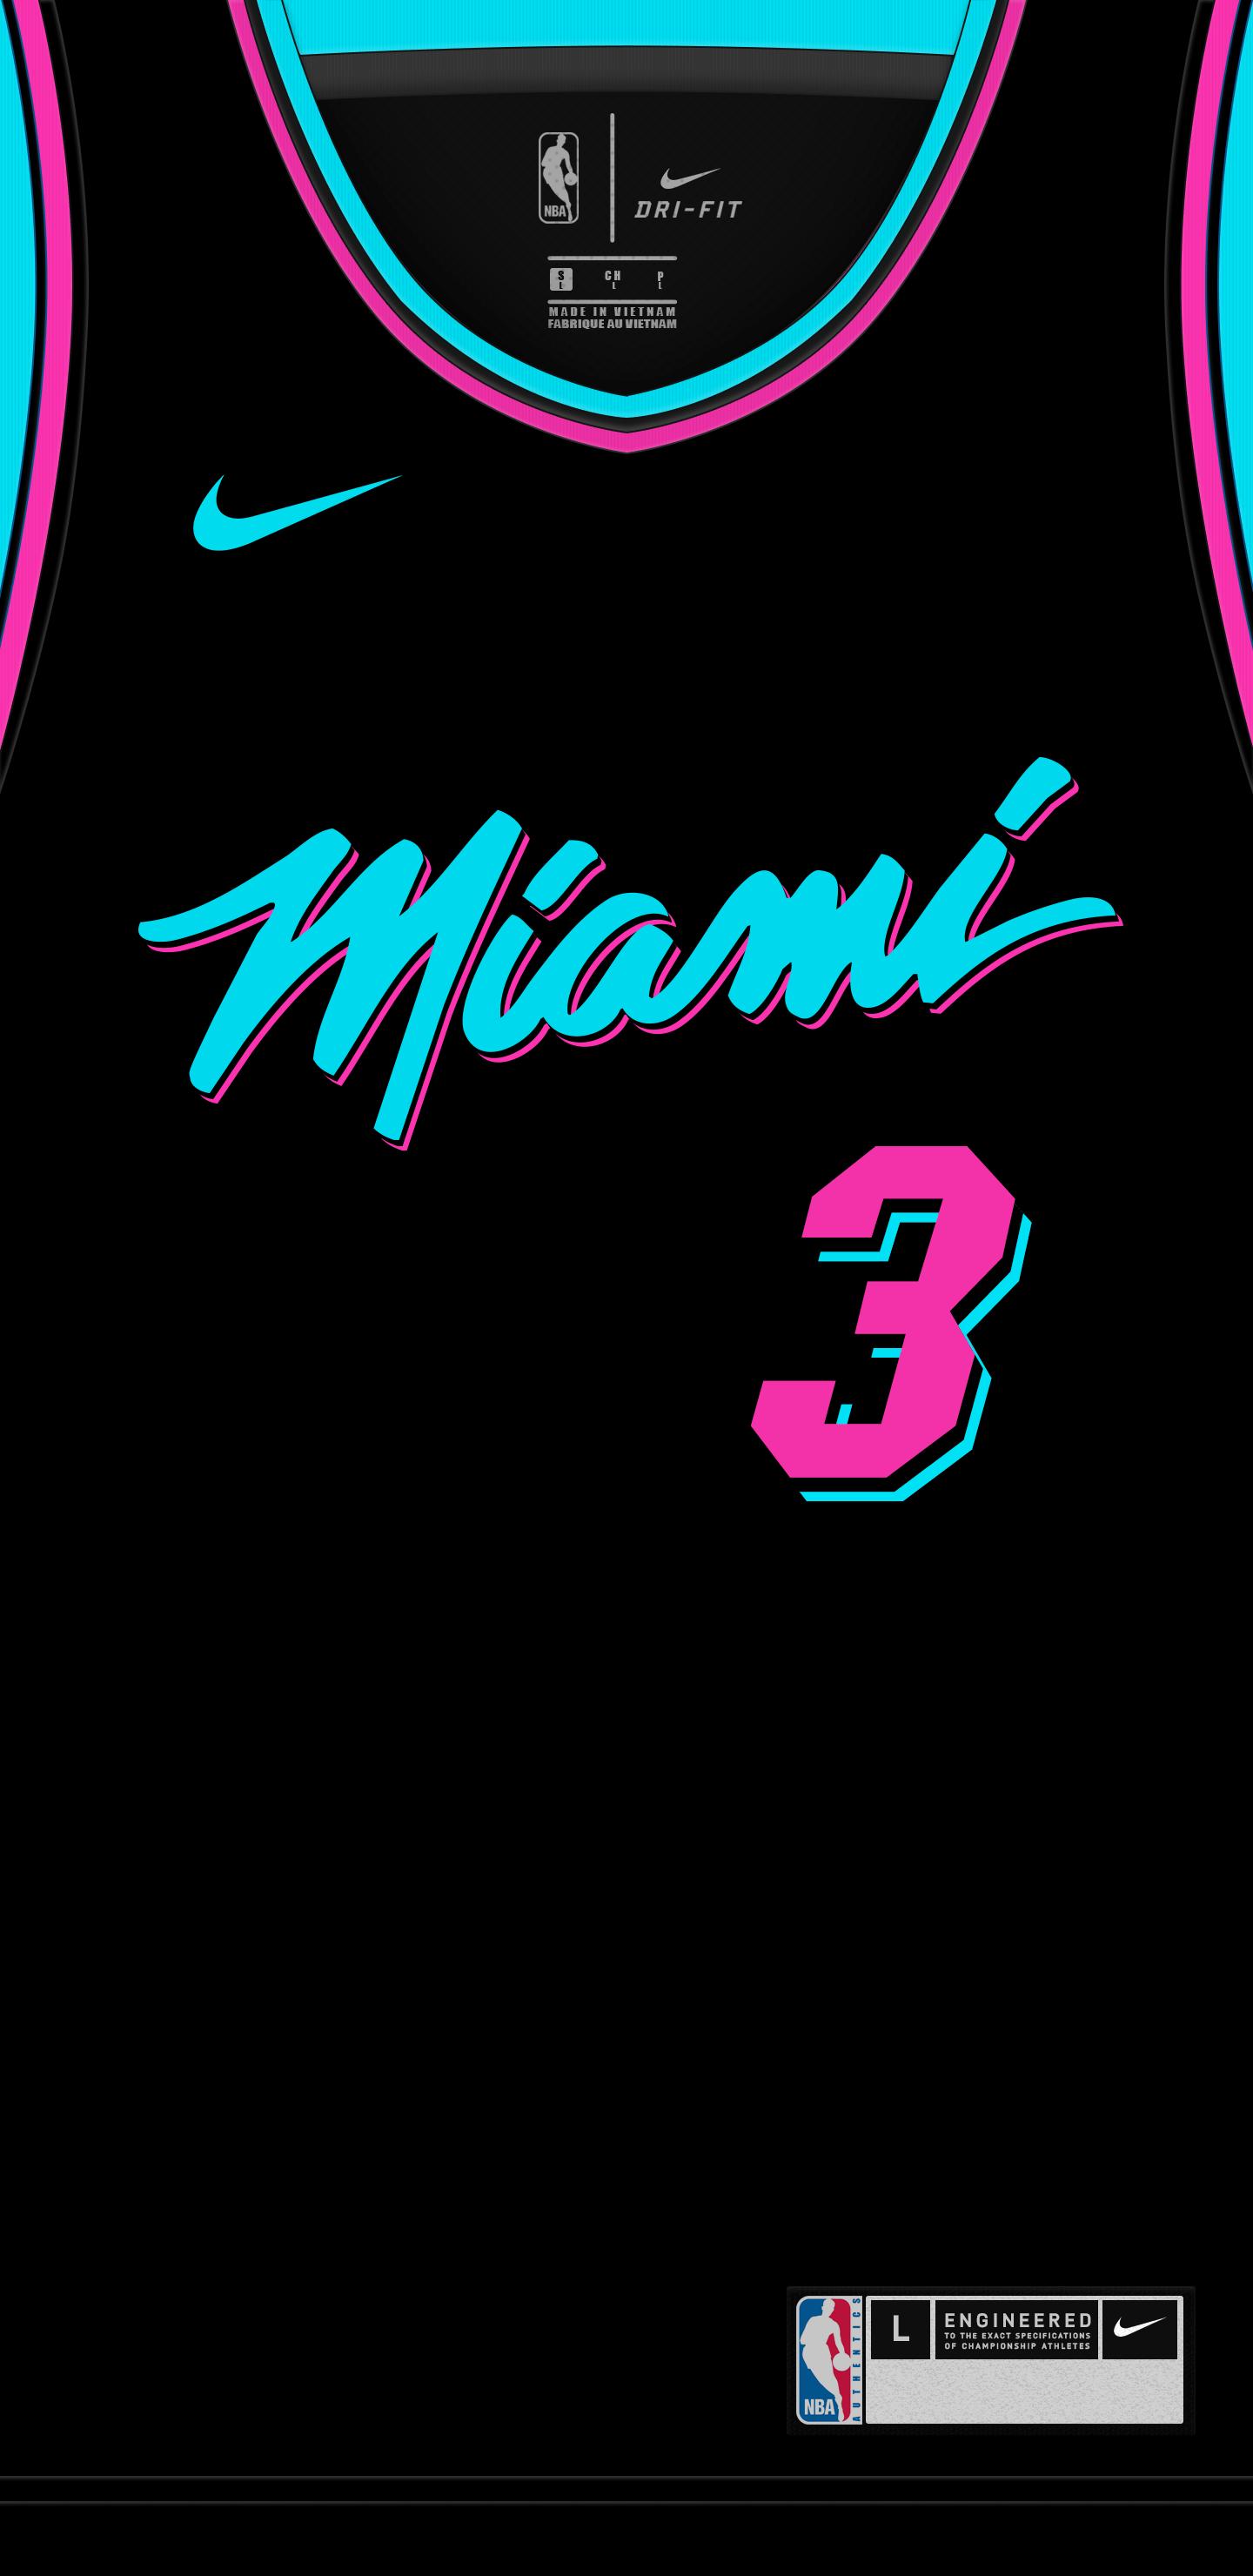 Nba Miami Heat Wallpaper Em 2020 Papel De Parede Da Nike Esportes Basquete